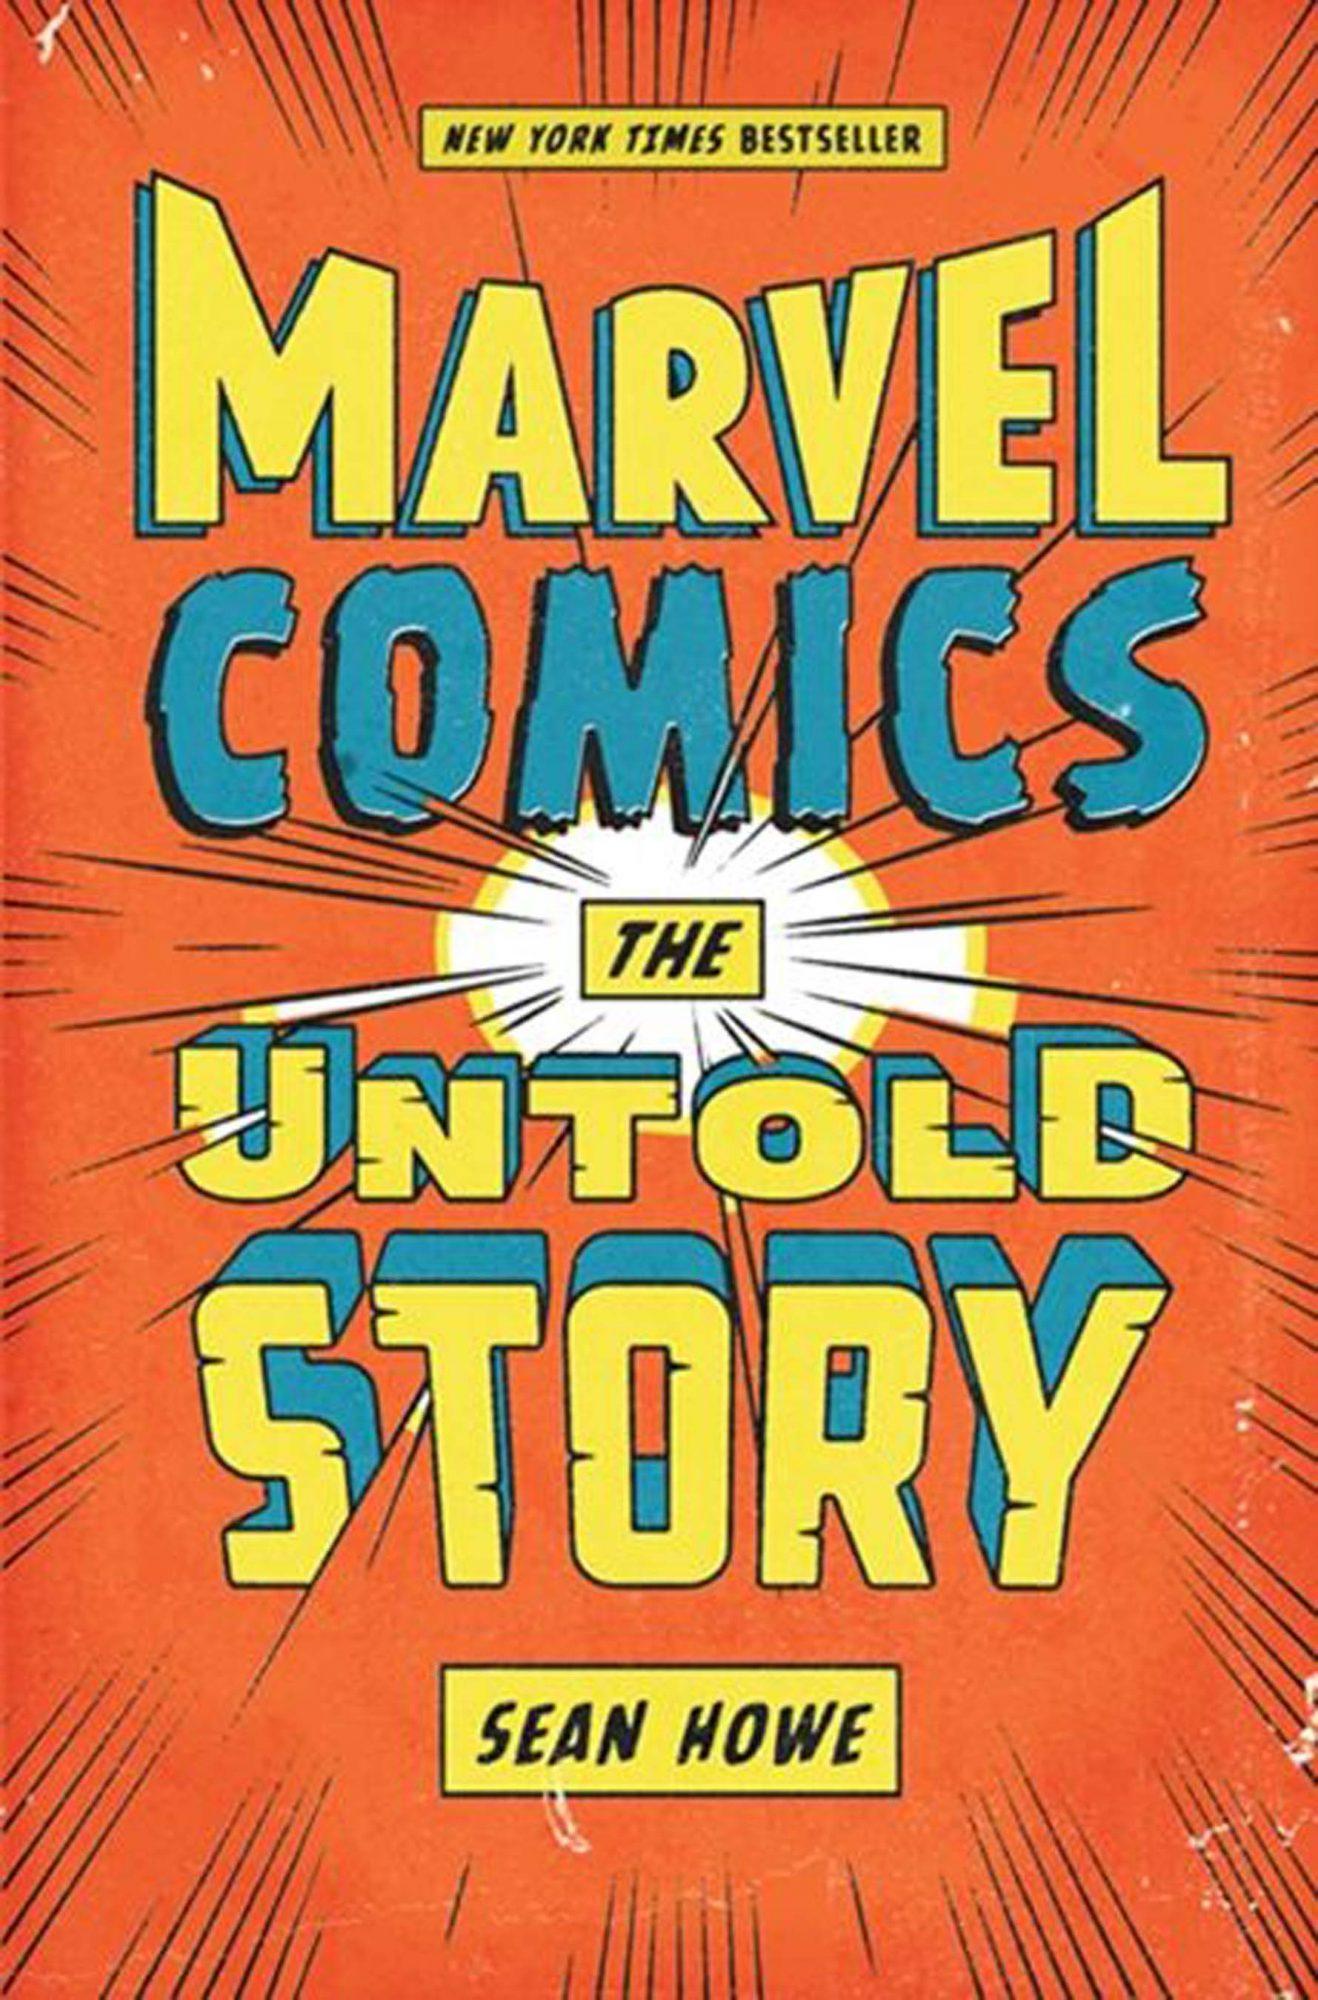 Marvel ComicsThe Untold Storyby Sean HowePublisher: Harper Perennial